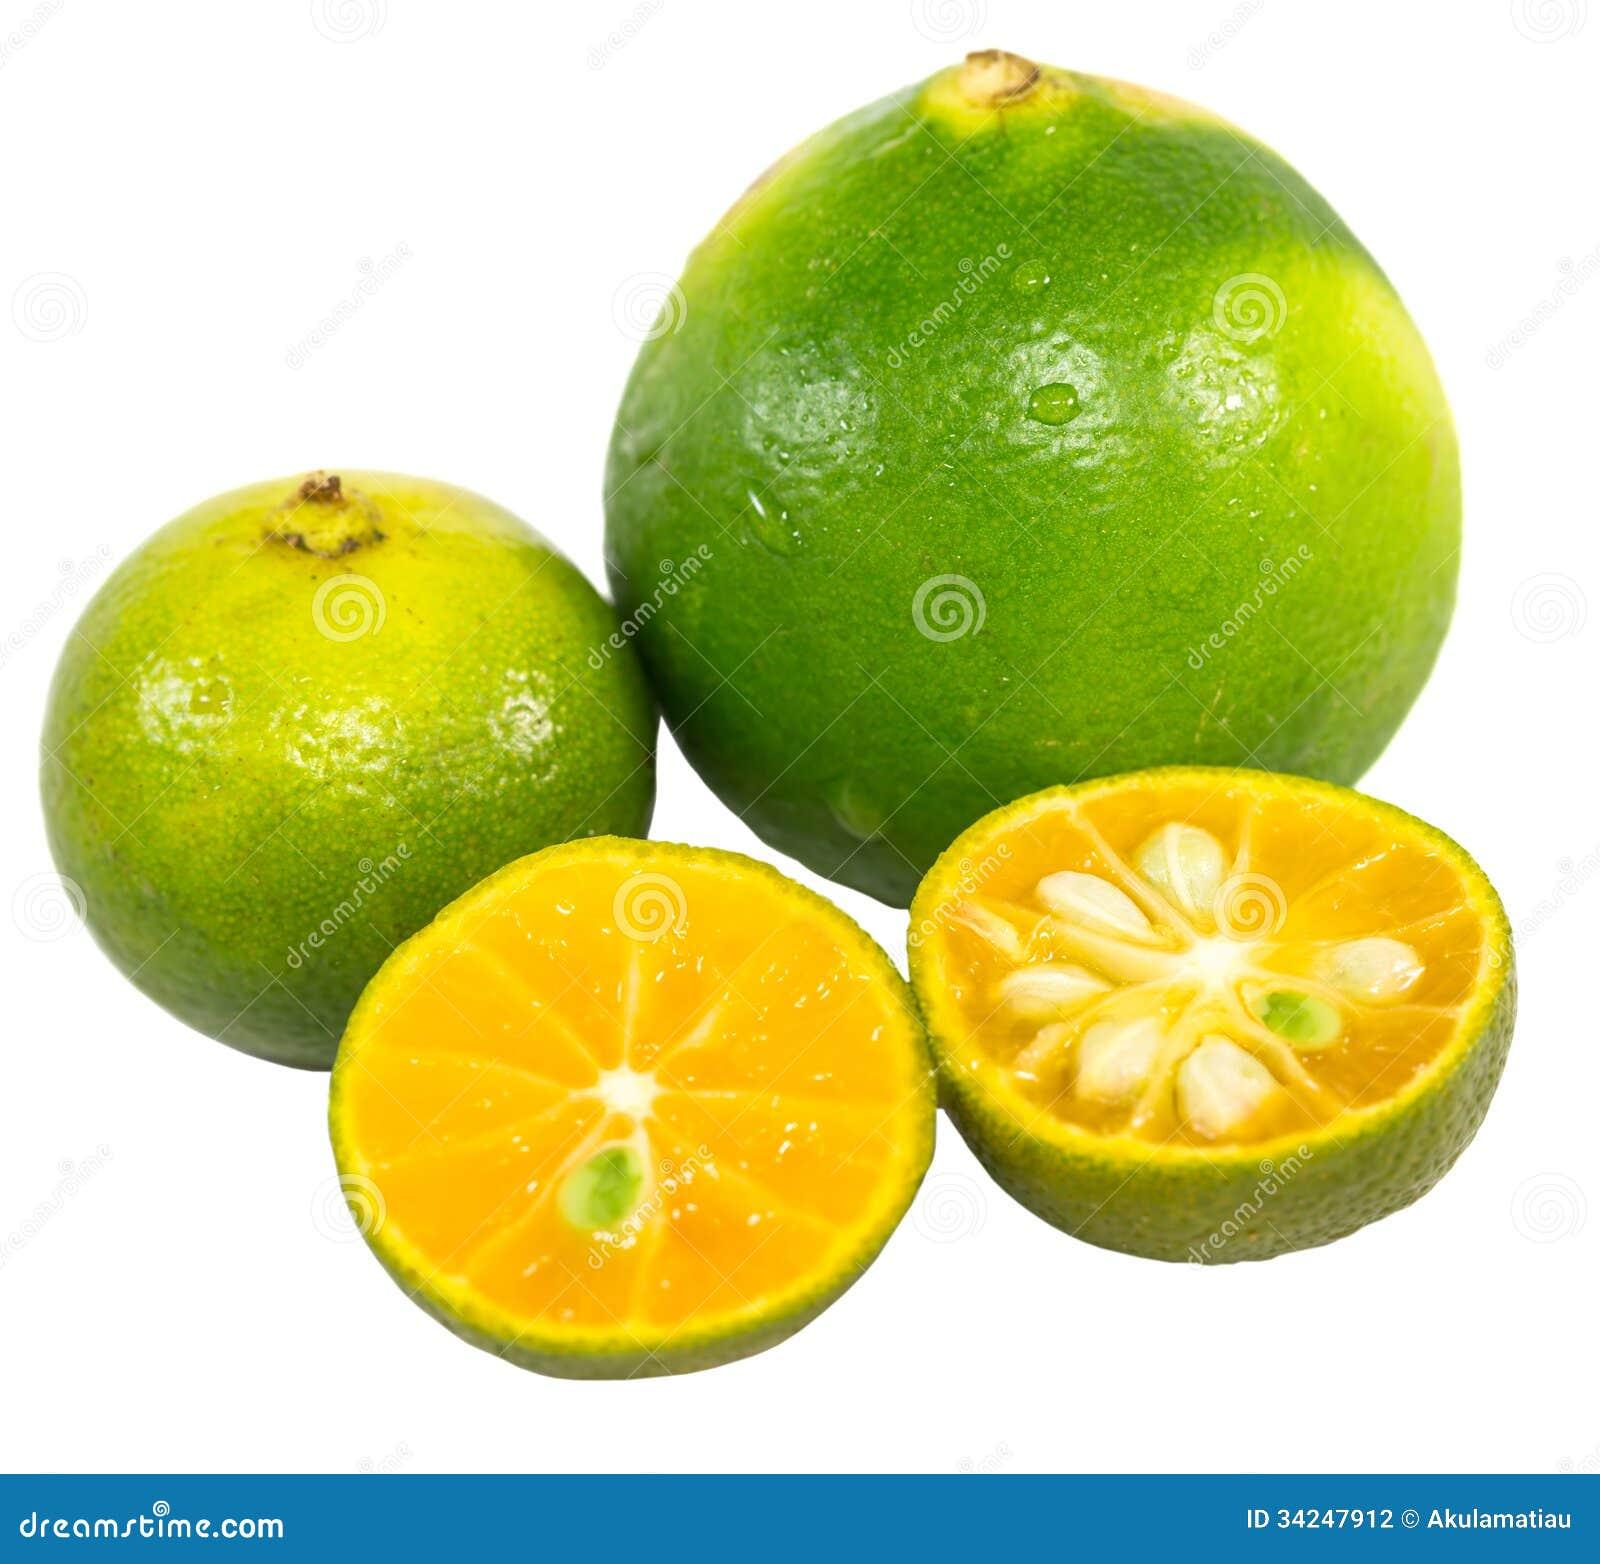 Blood Orange Fruit Related Keywords & Suggestions - Blood Orange Fruit ...